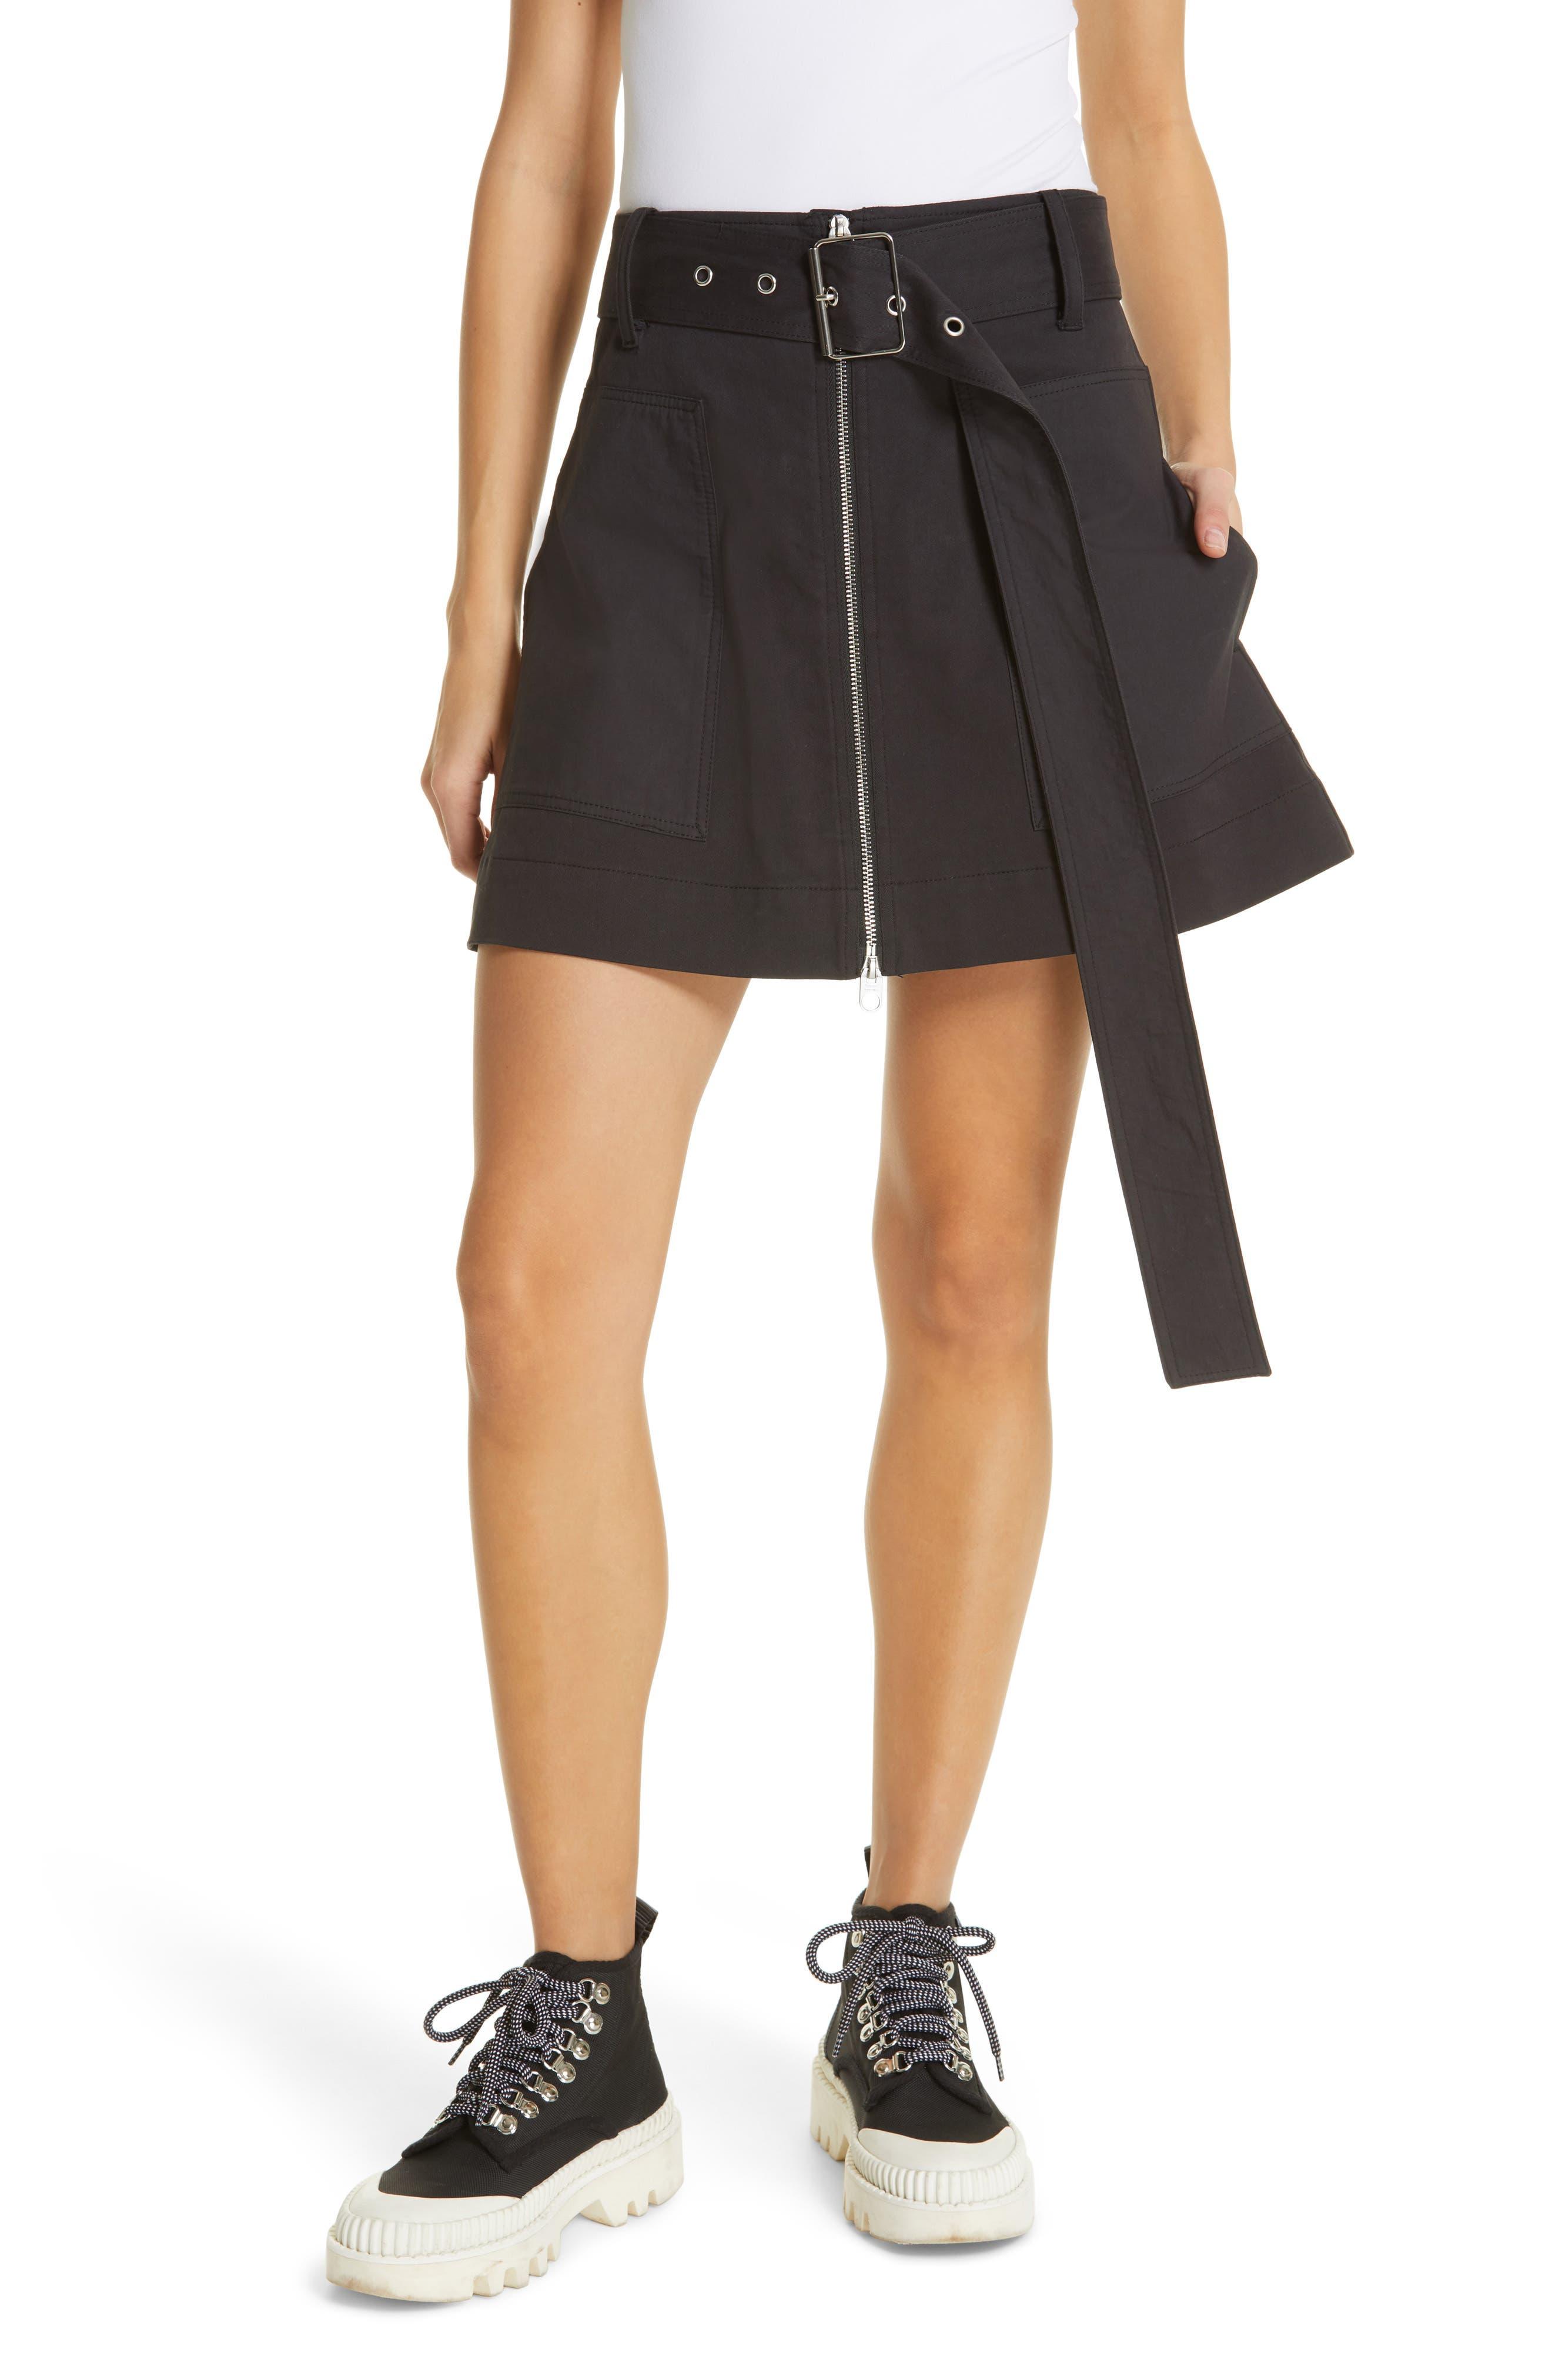 PROENZA SCHOULER PSWL Belted Utility Skirt, Main, color, BLACK